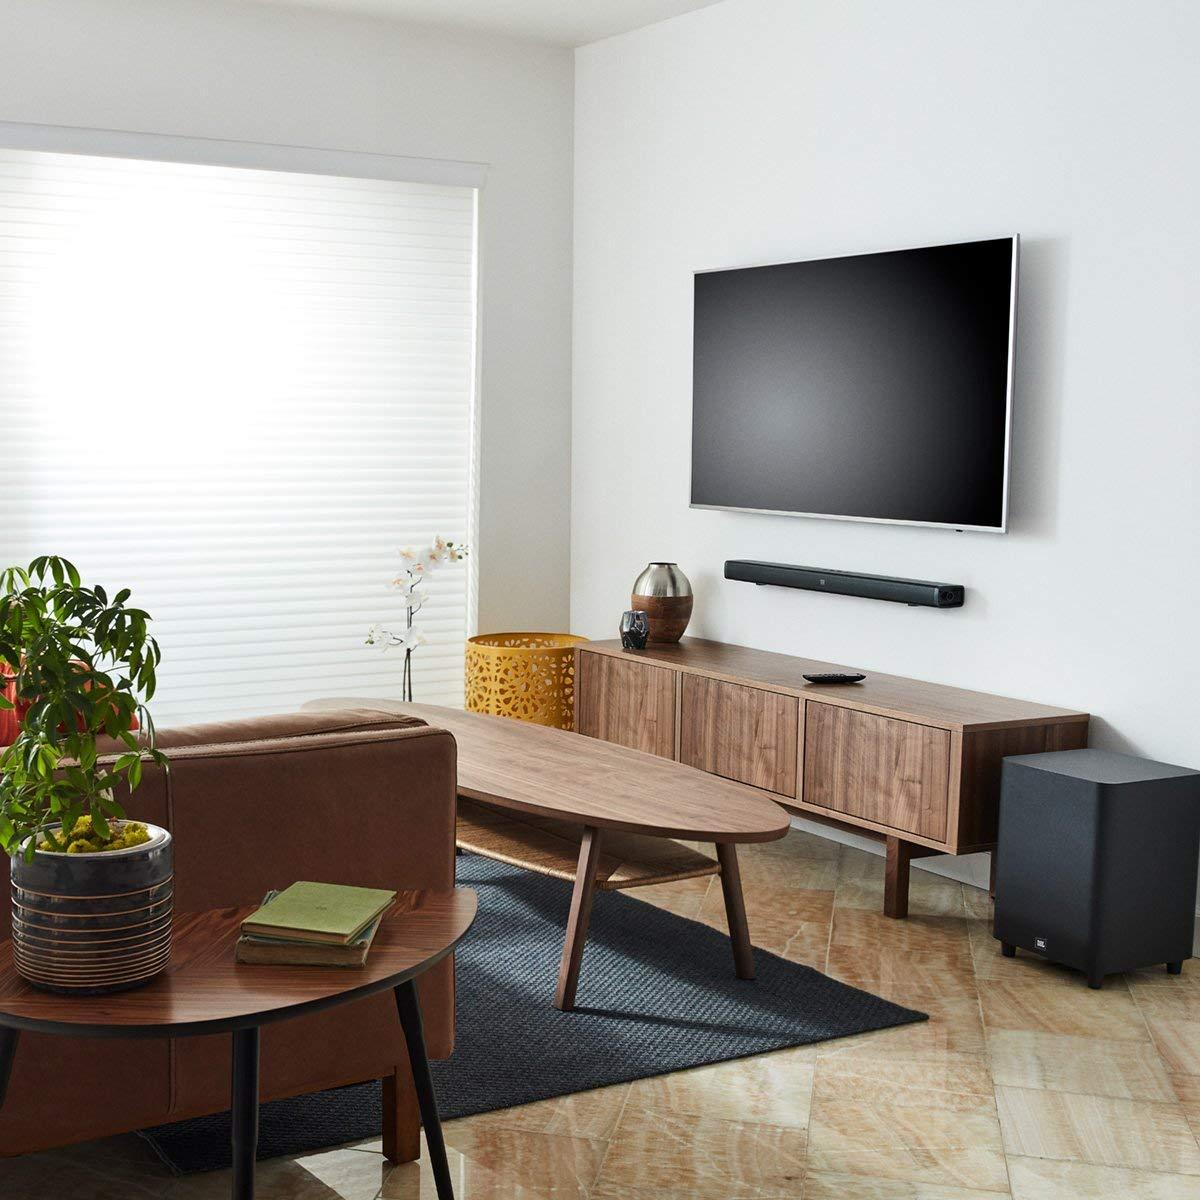 living room with a TV and soundbar